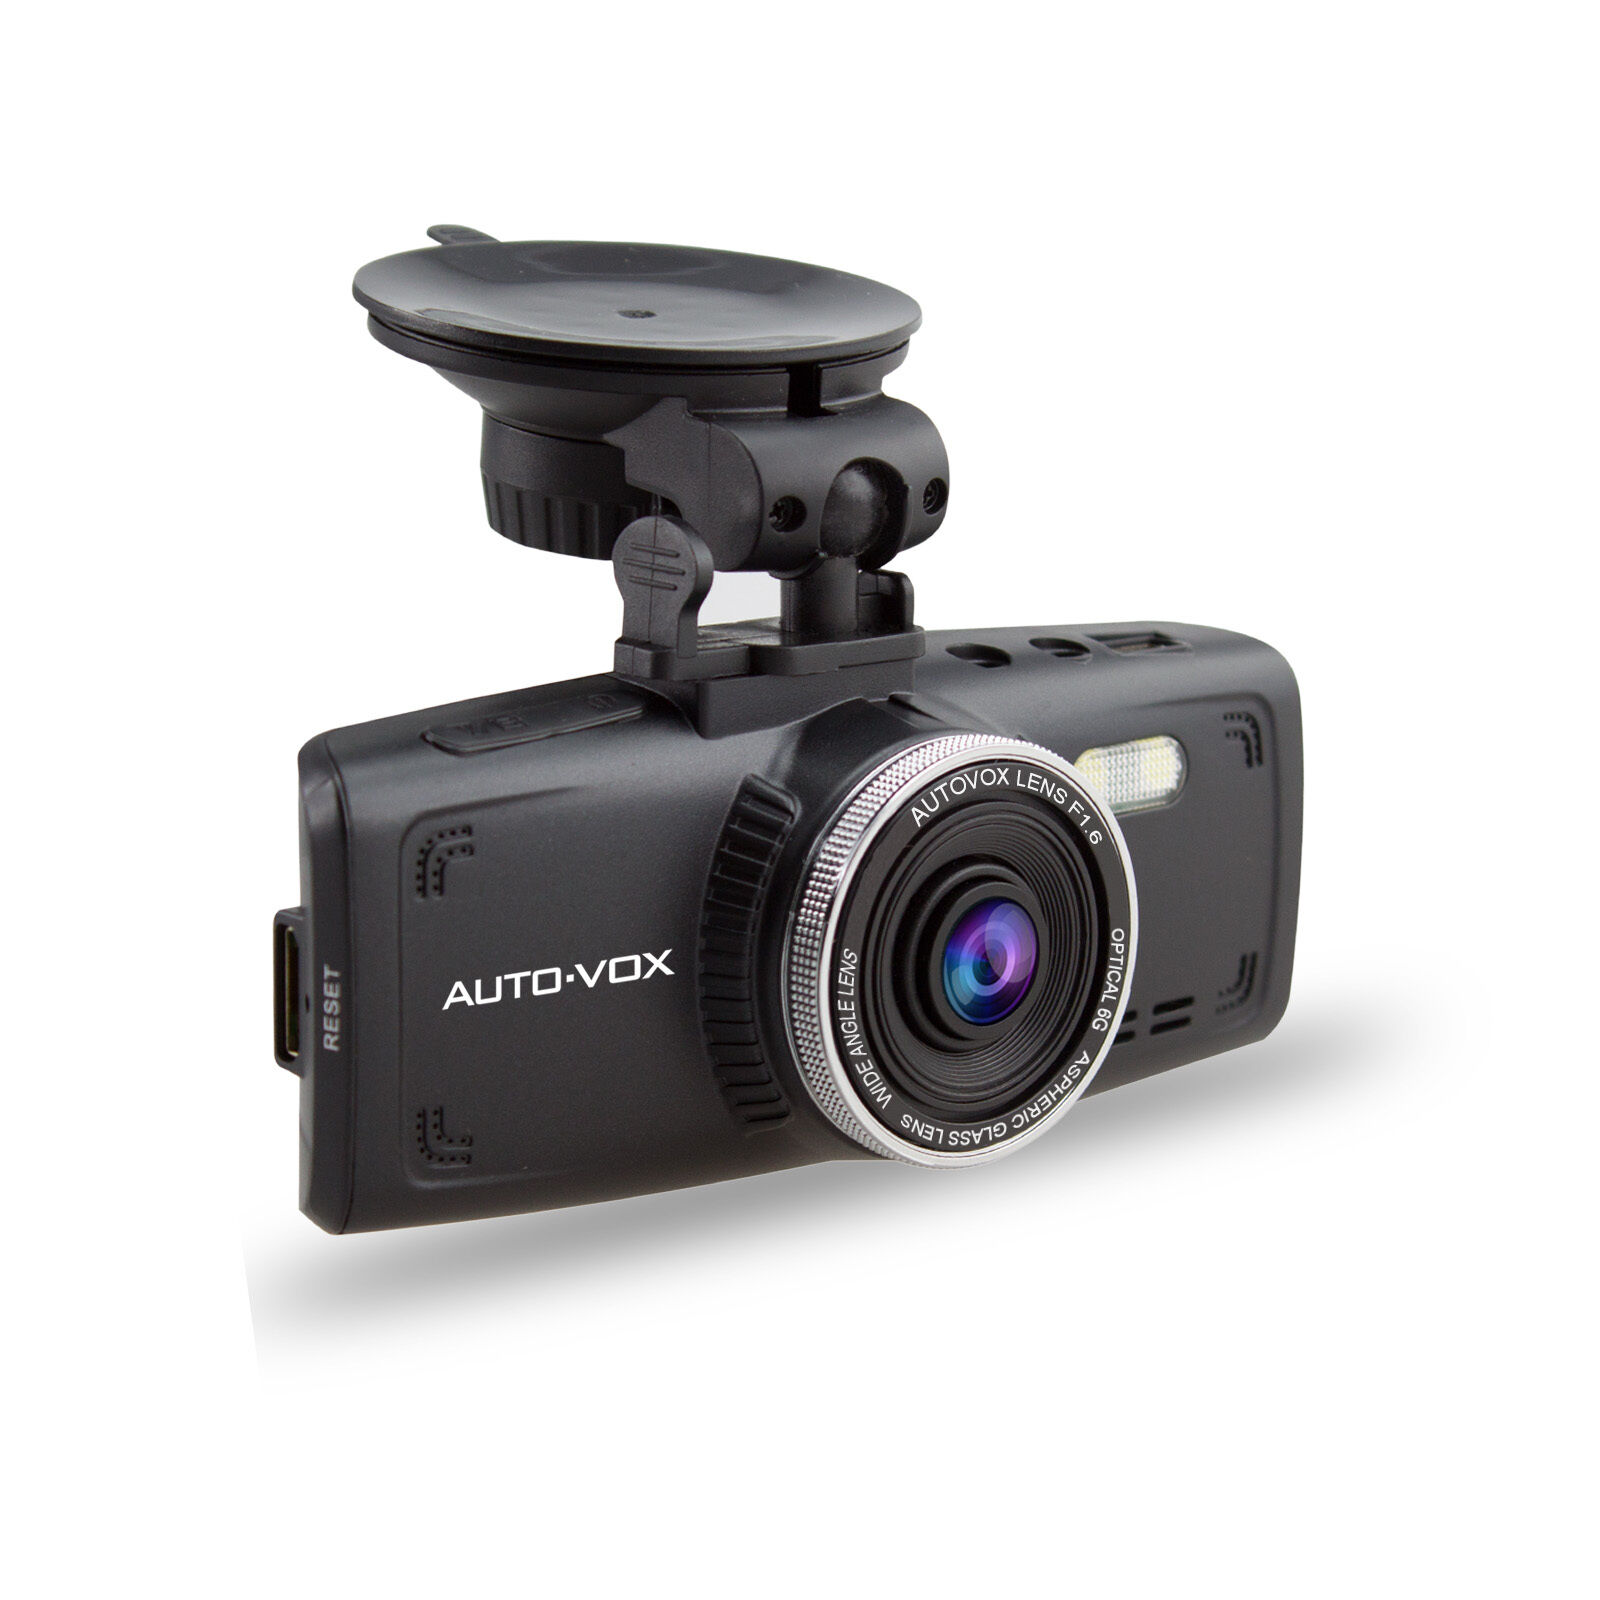 s-l1600 2.7'' HD 1080P Car DVR Dashboard Camera Video Recorder Dash Cam Night Vision